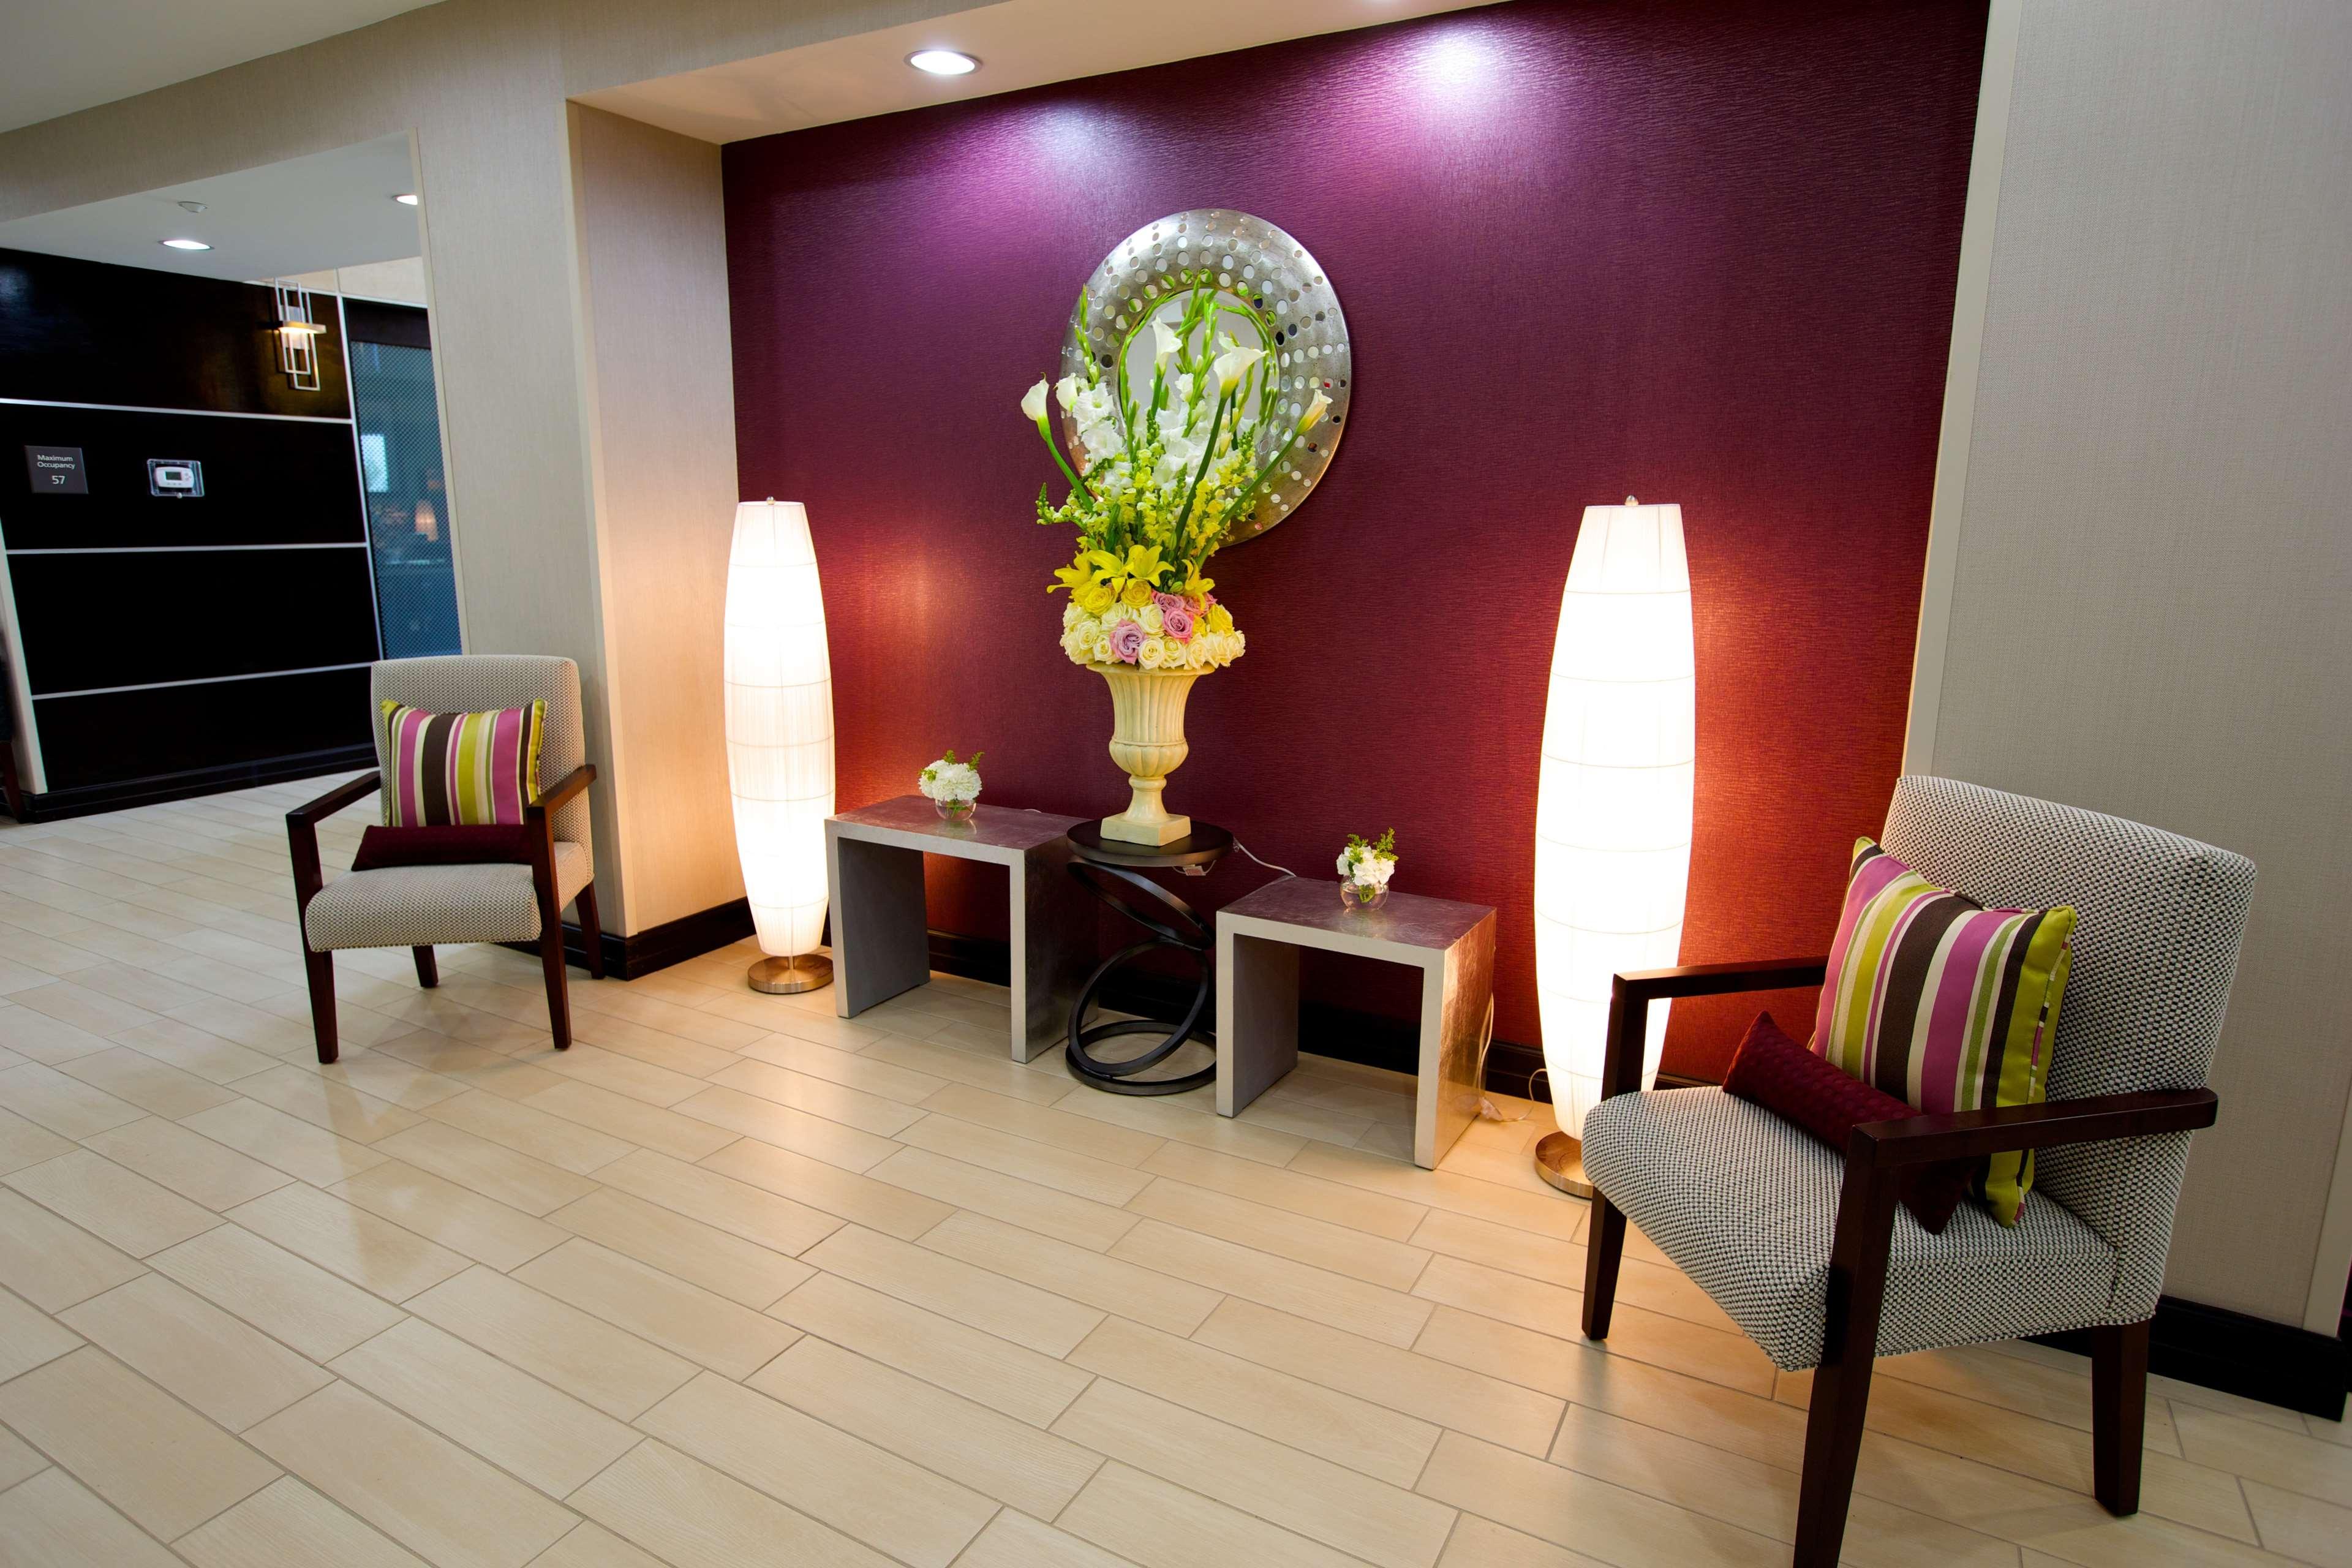 Hampton Inn & Suites Missouri City, TX image 7